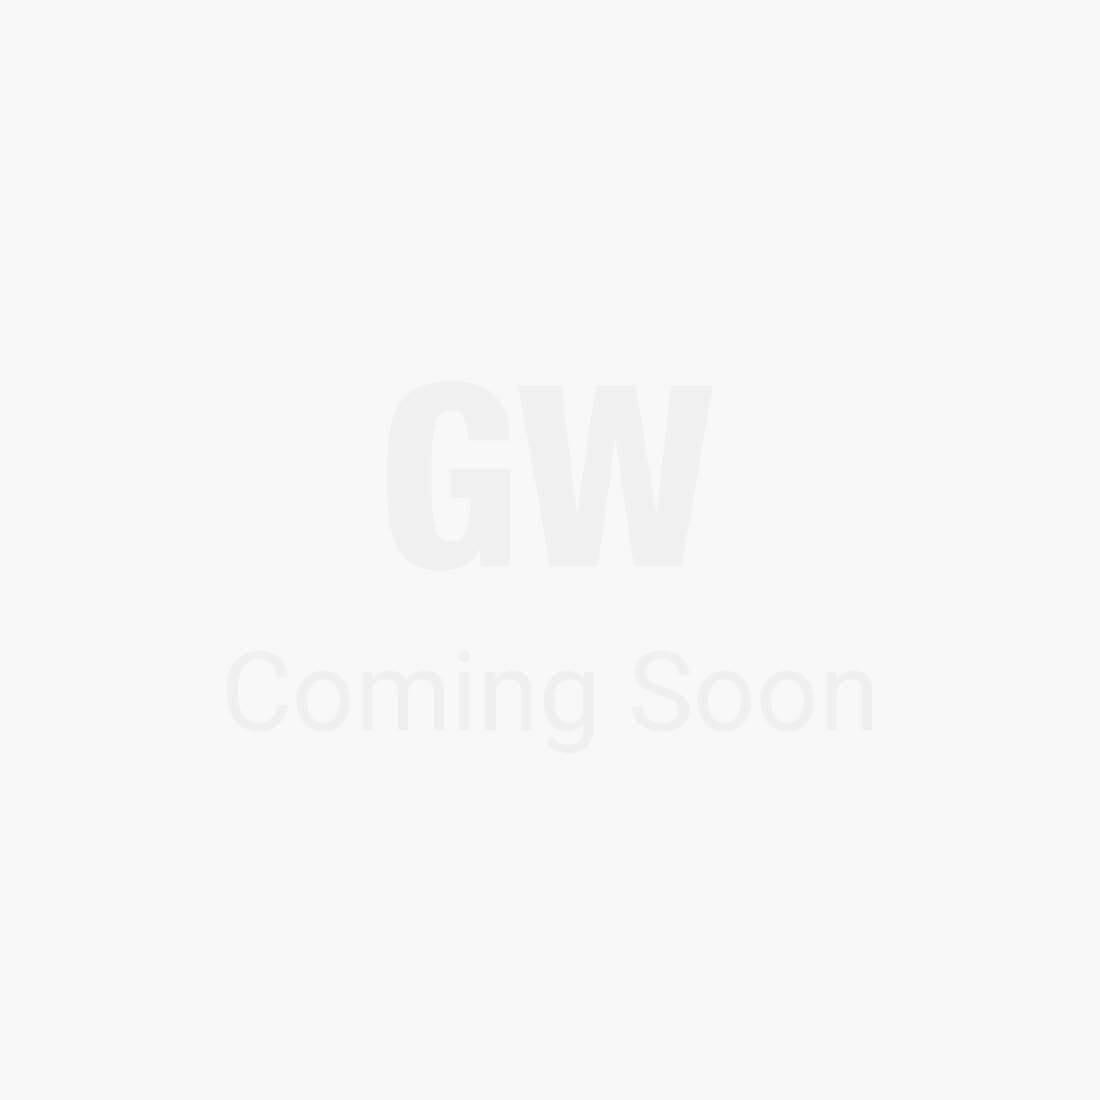 Franklin Arm Chair